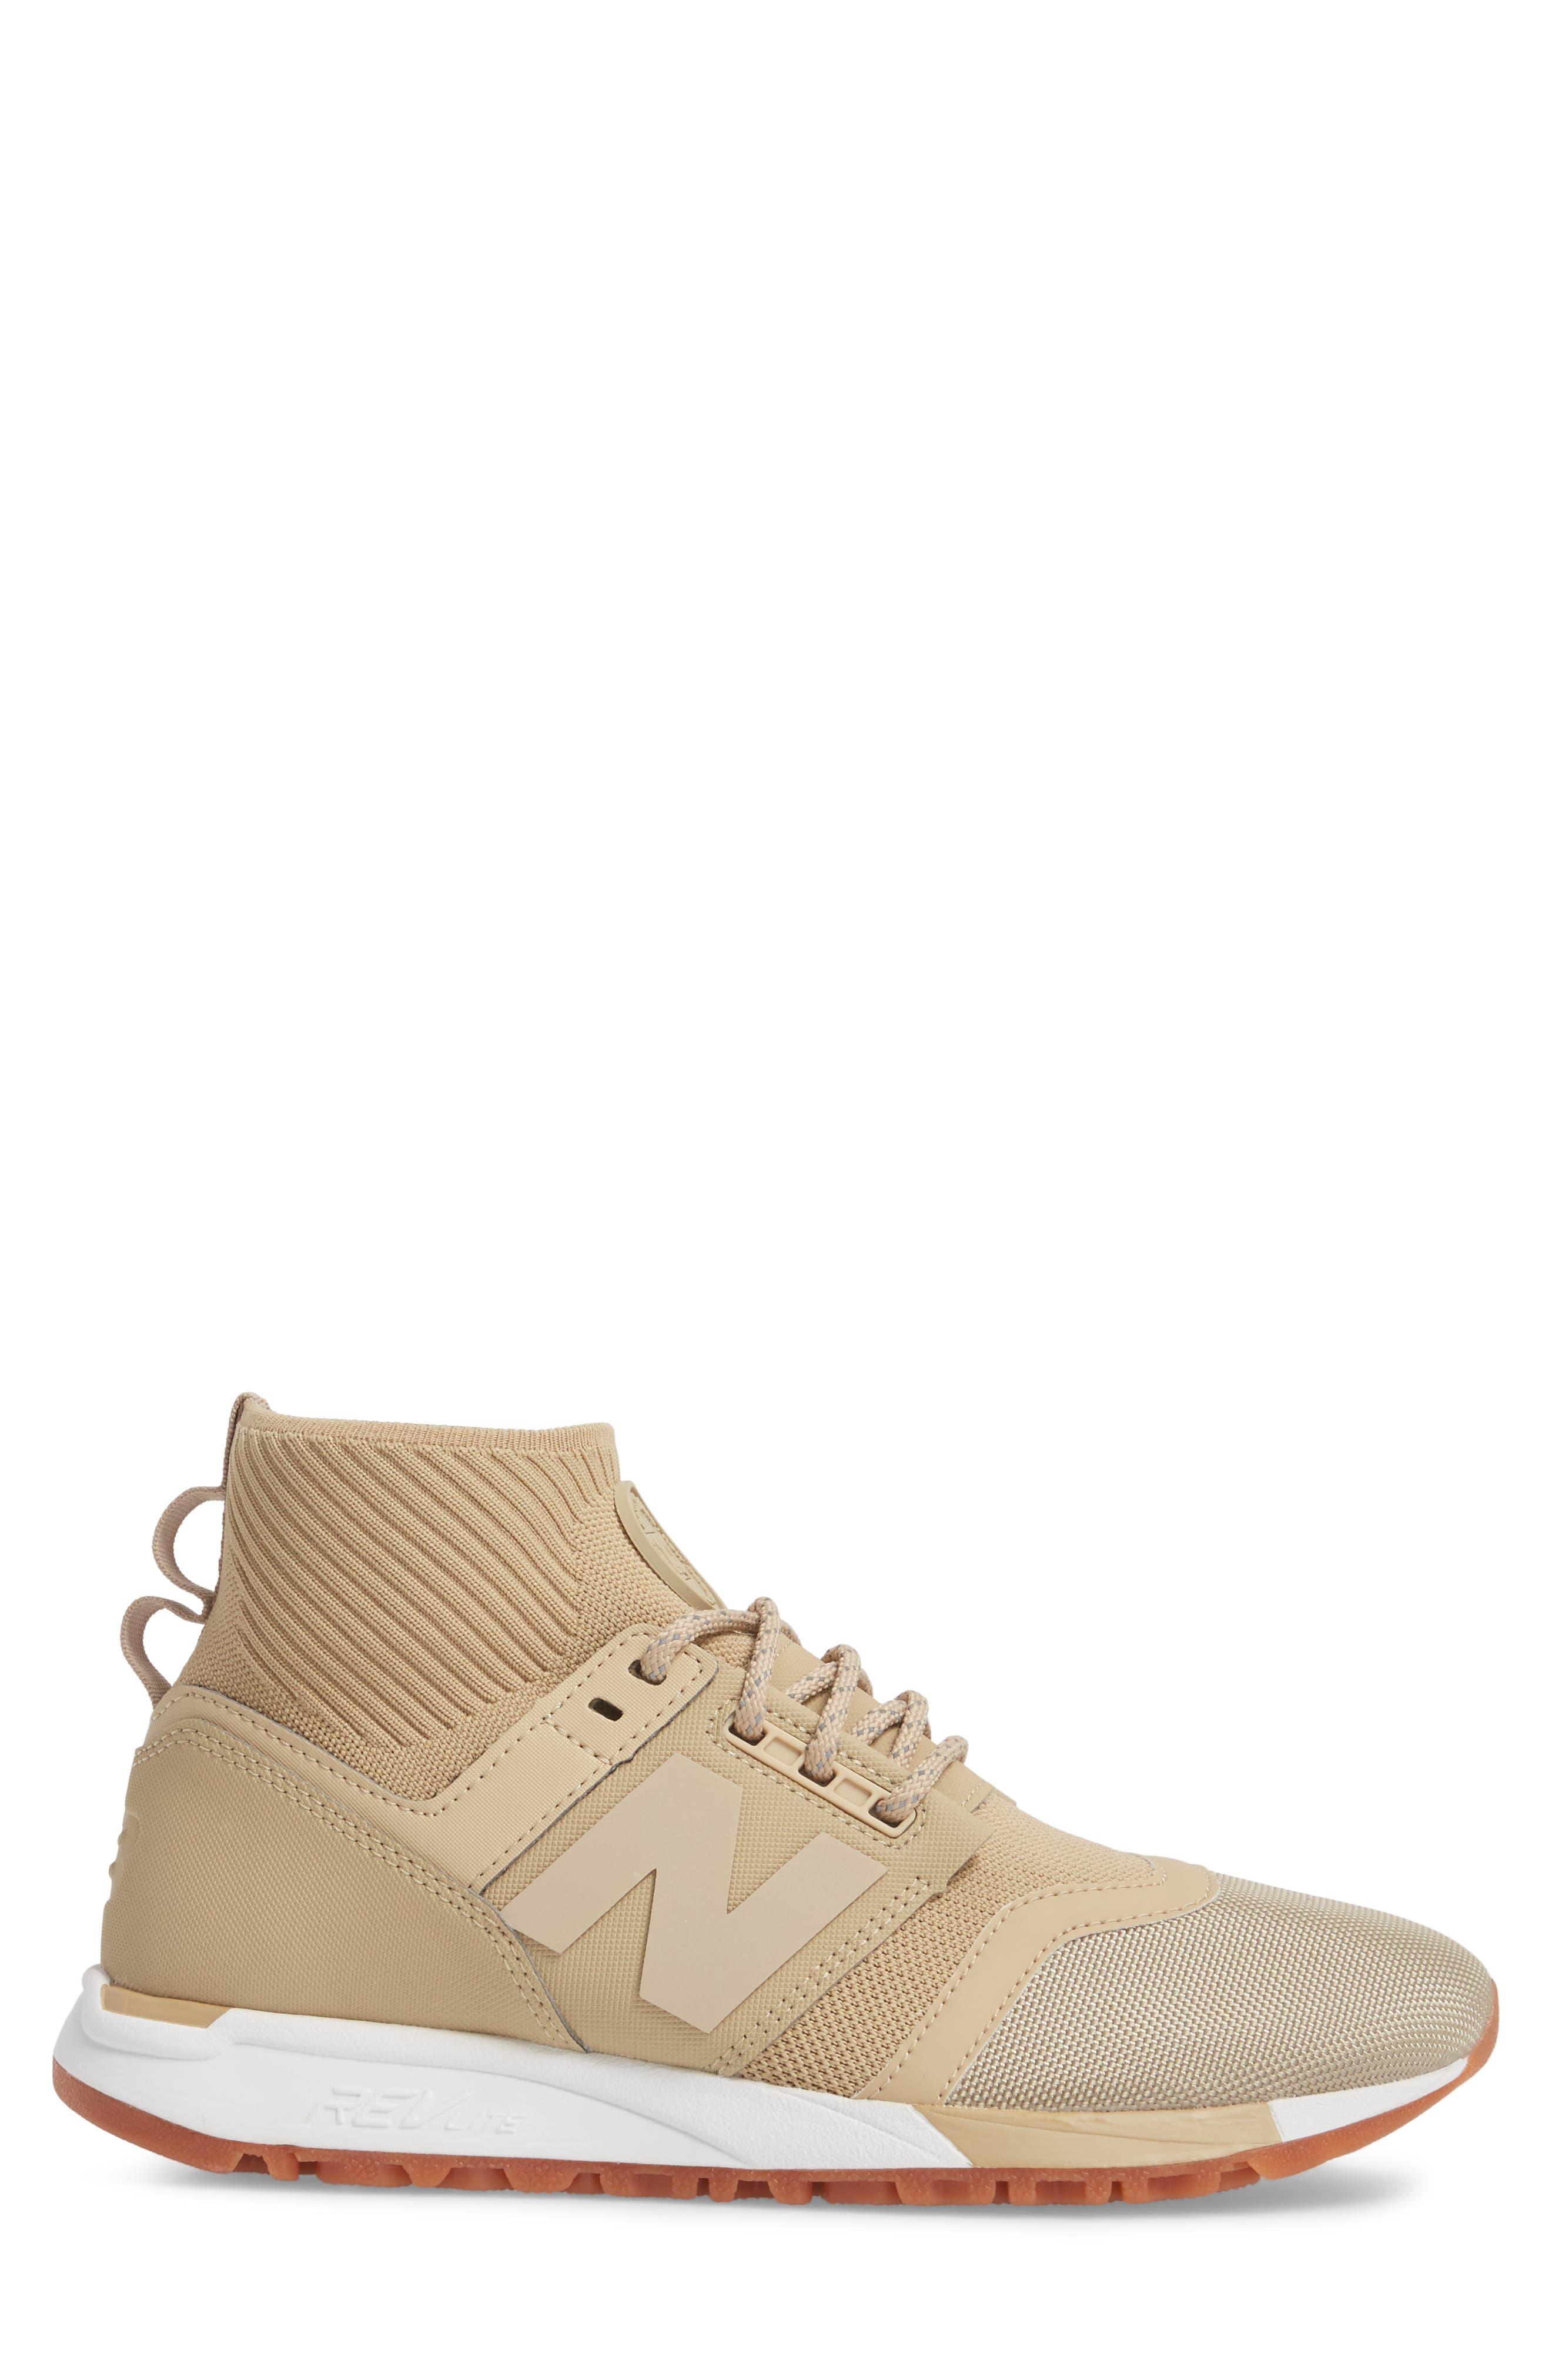 247 Mid Sneaker,                             Alternate thumbnail 11, color,